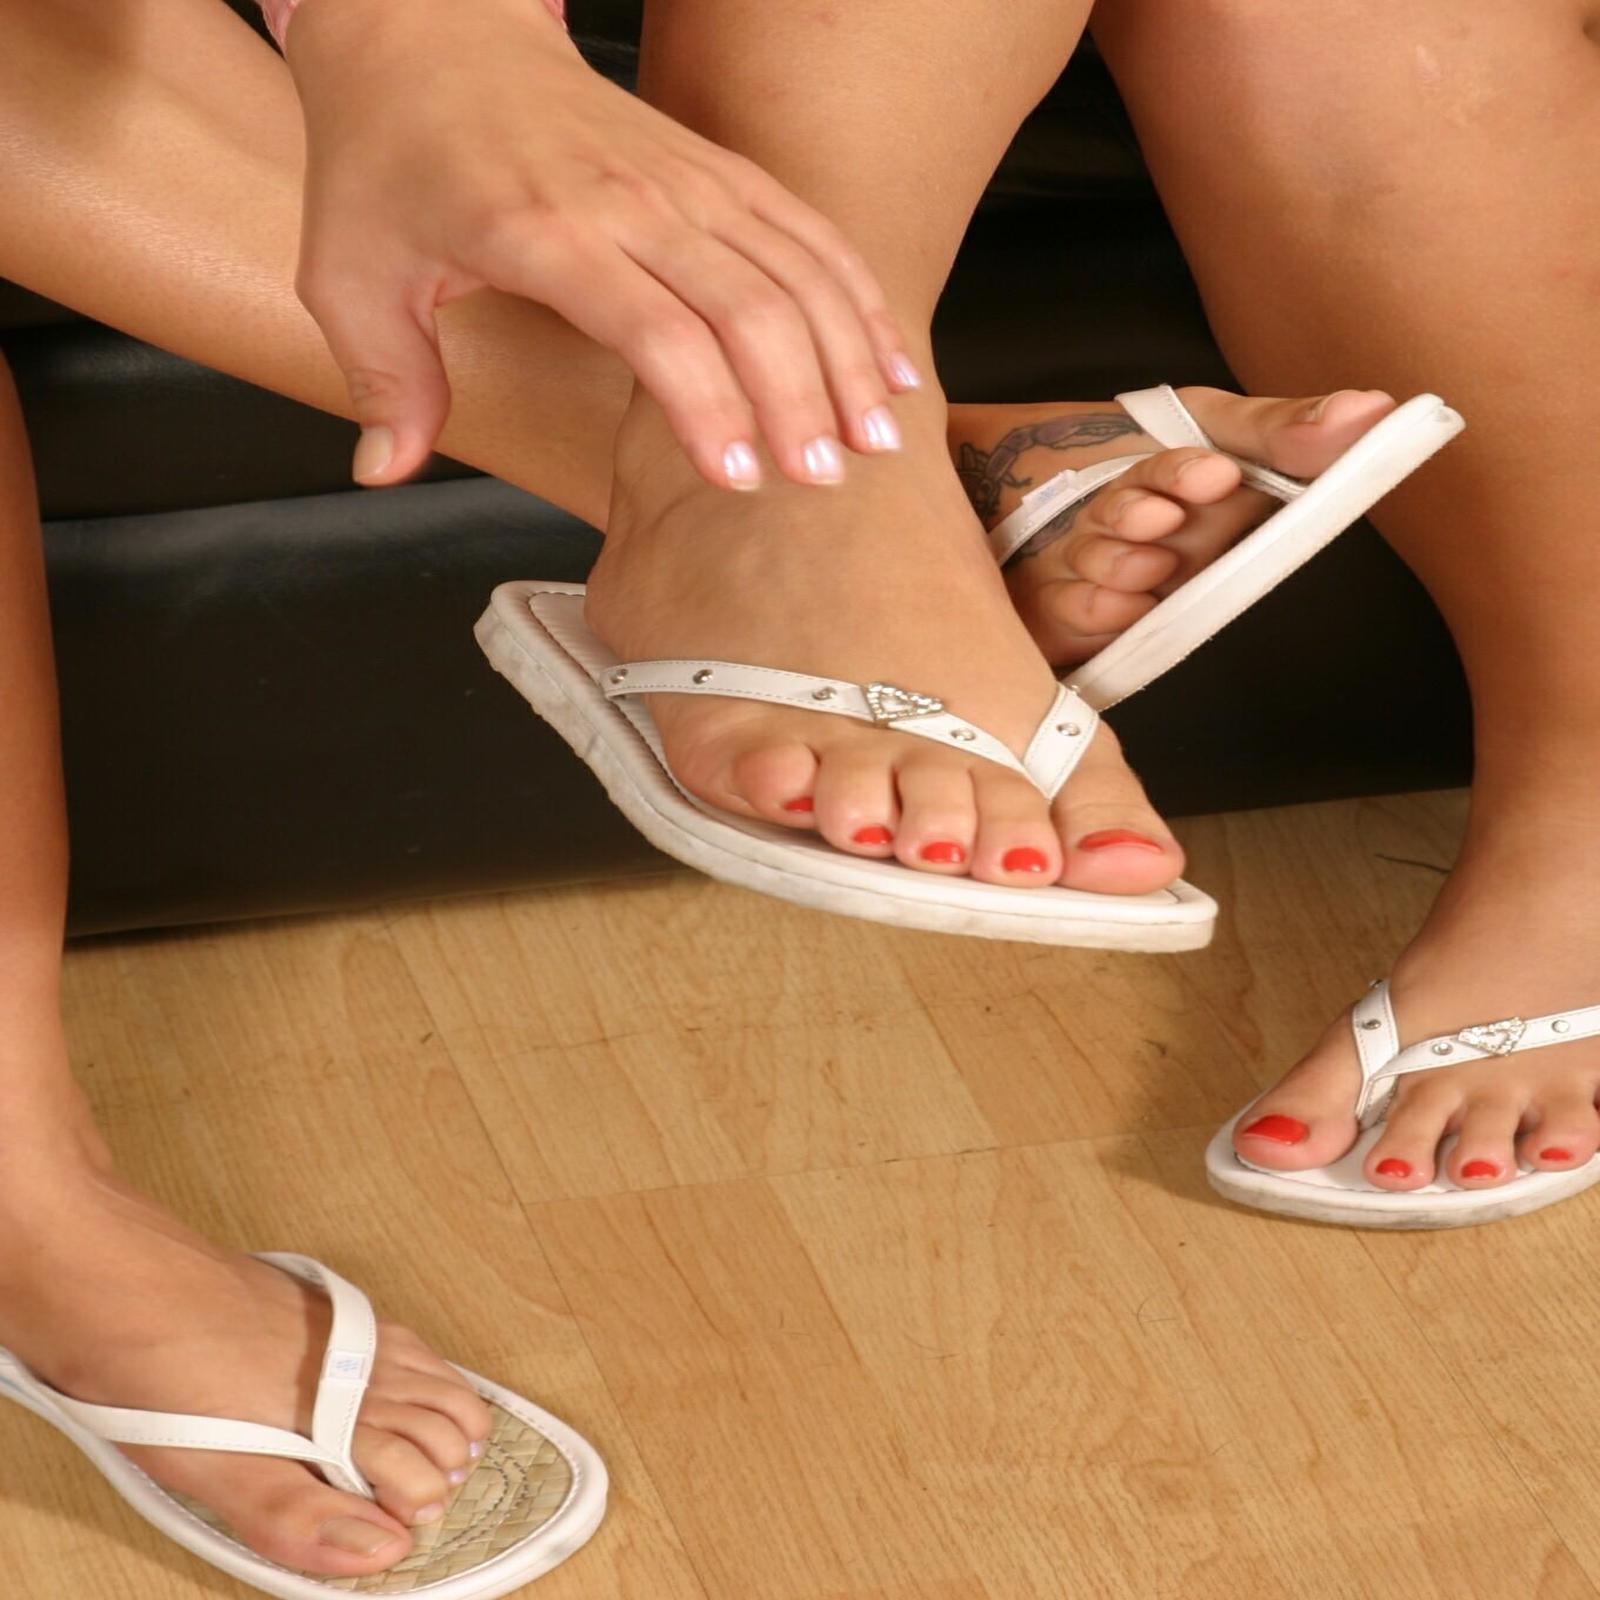 Foot Fetish Lesbian Sex